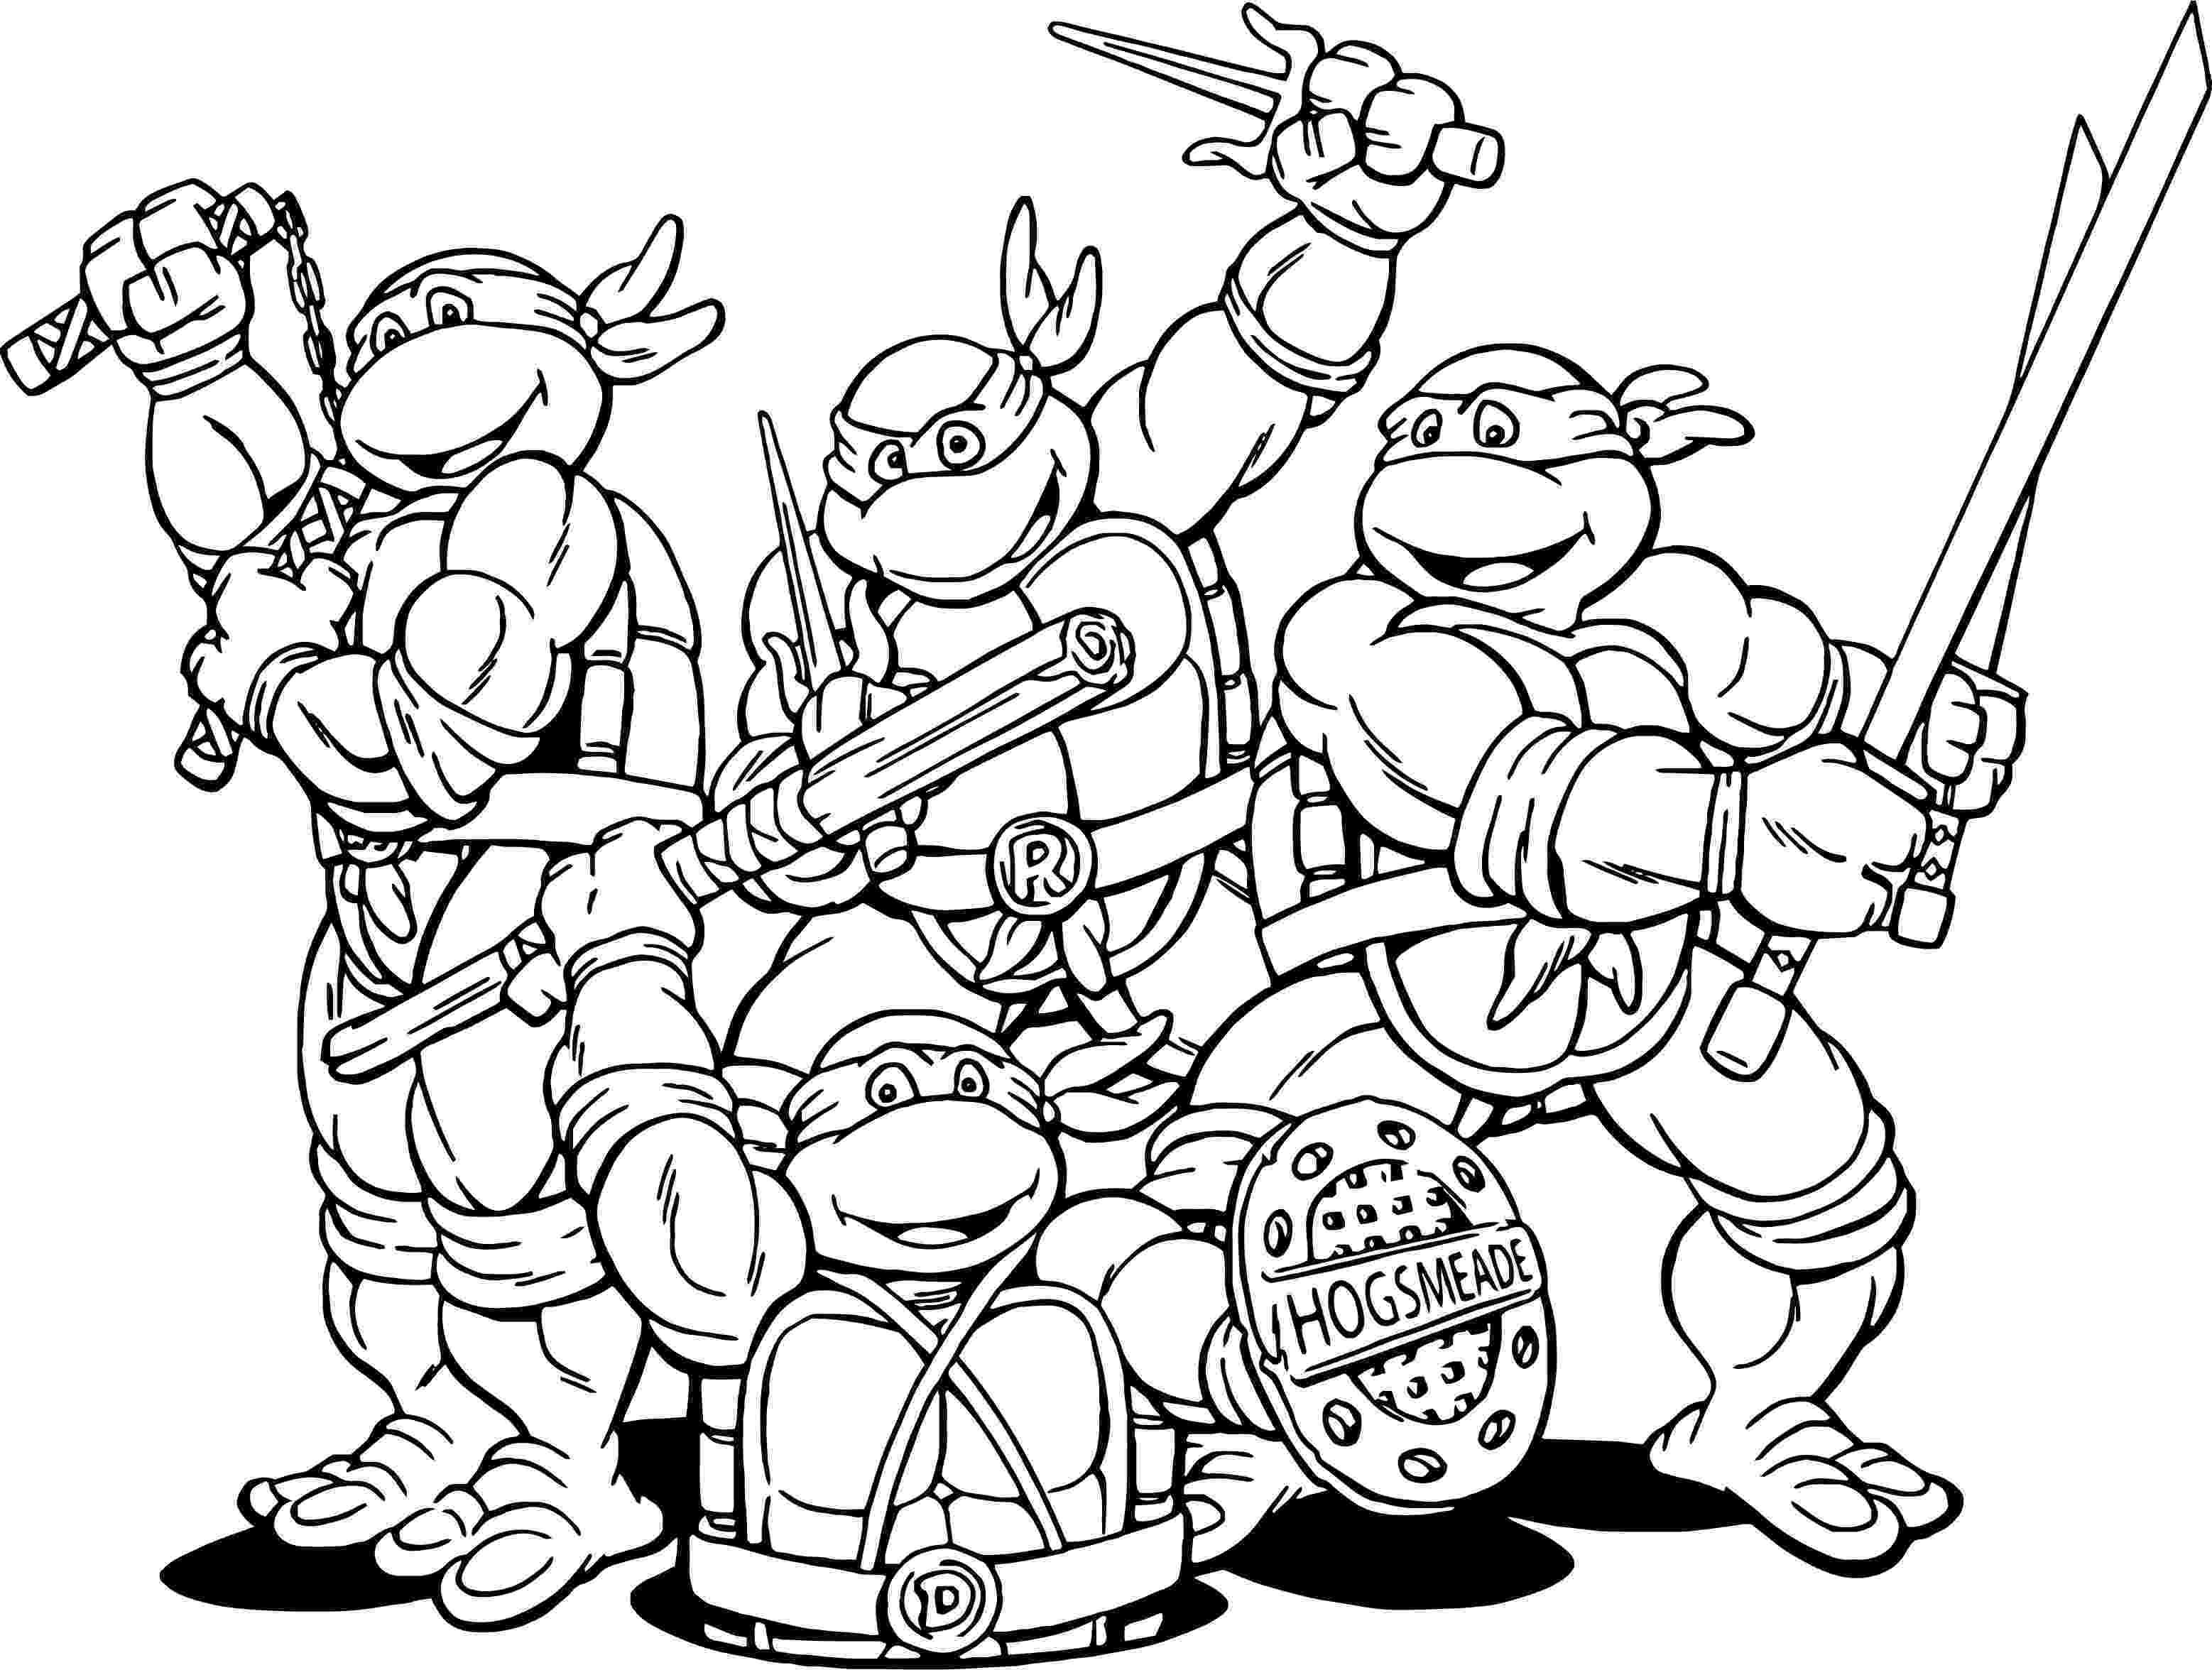 ninja turtles free coloring pages ninja turtles coloring pages free download best ninja turtles pages free coloring ninja